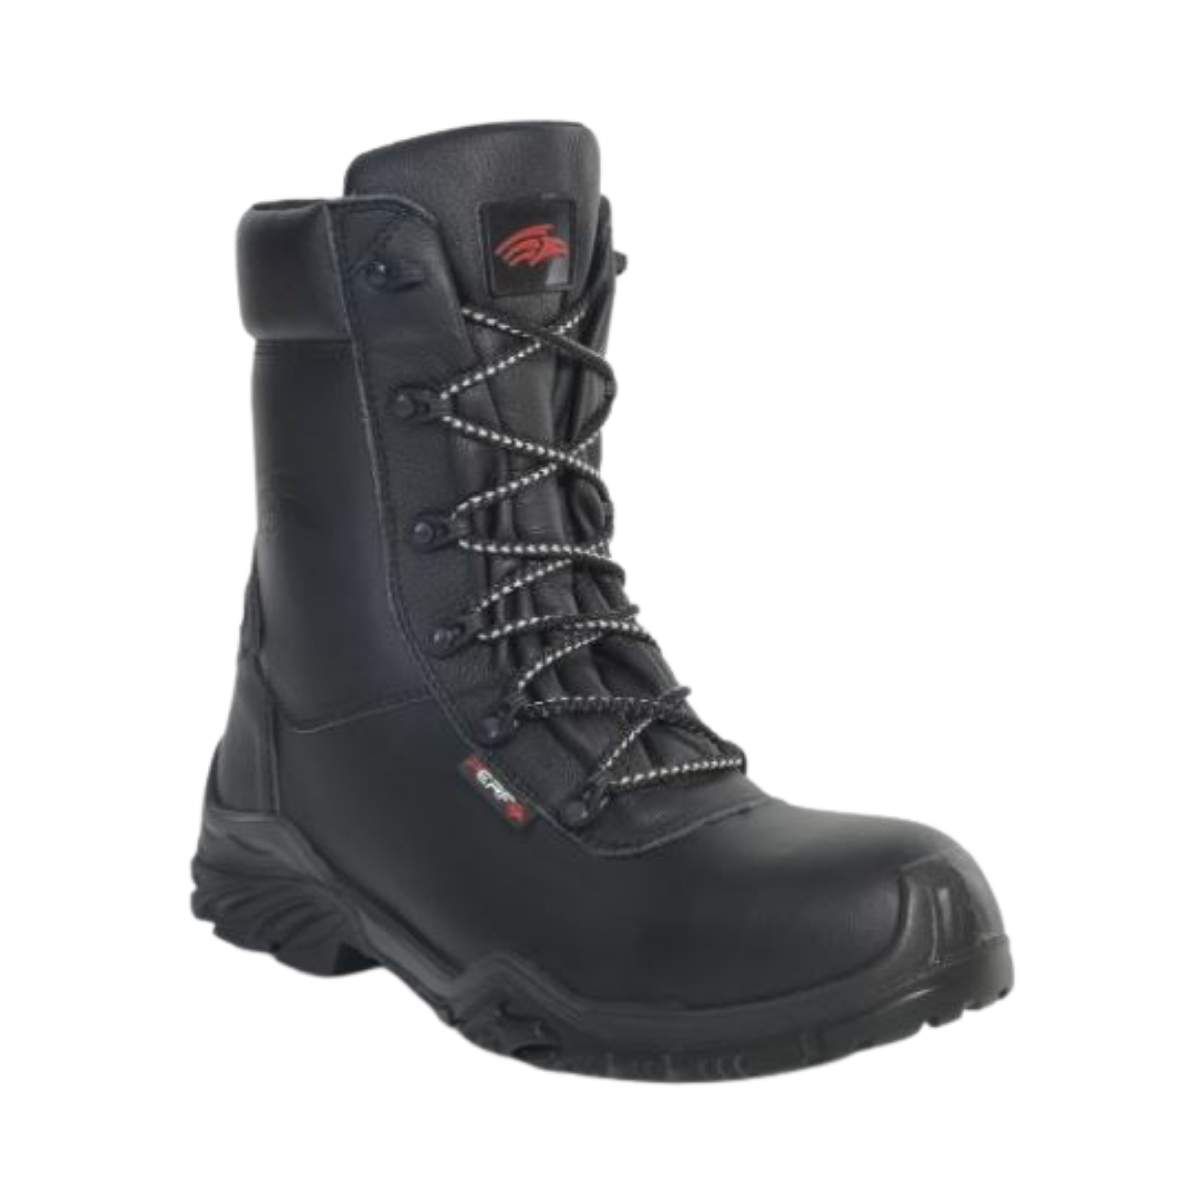 SF0103-N_Platform Lightweight Zip-Sided Safety Boot